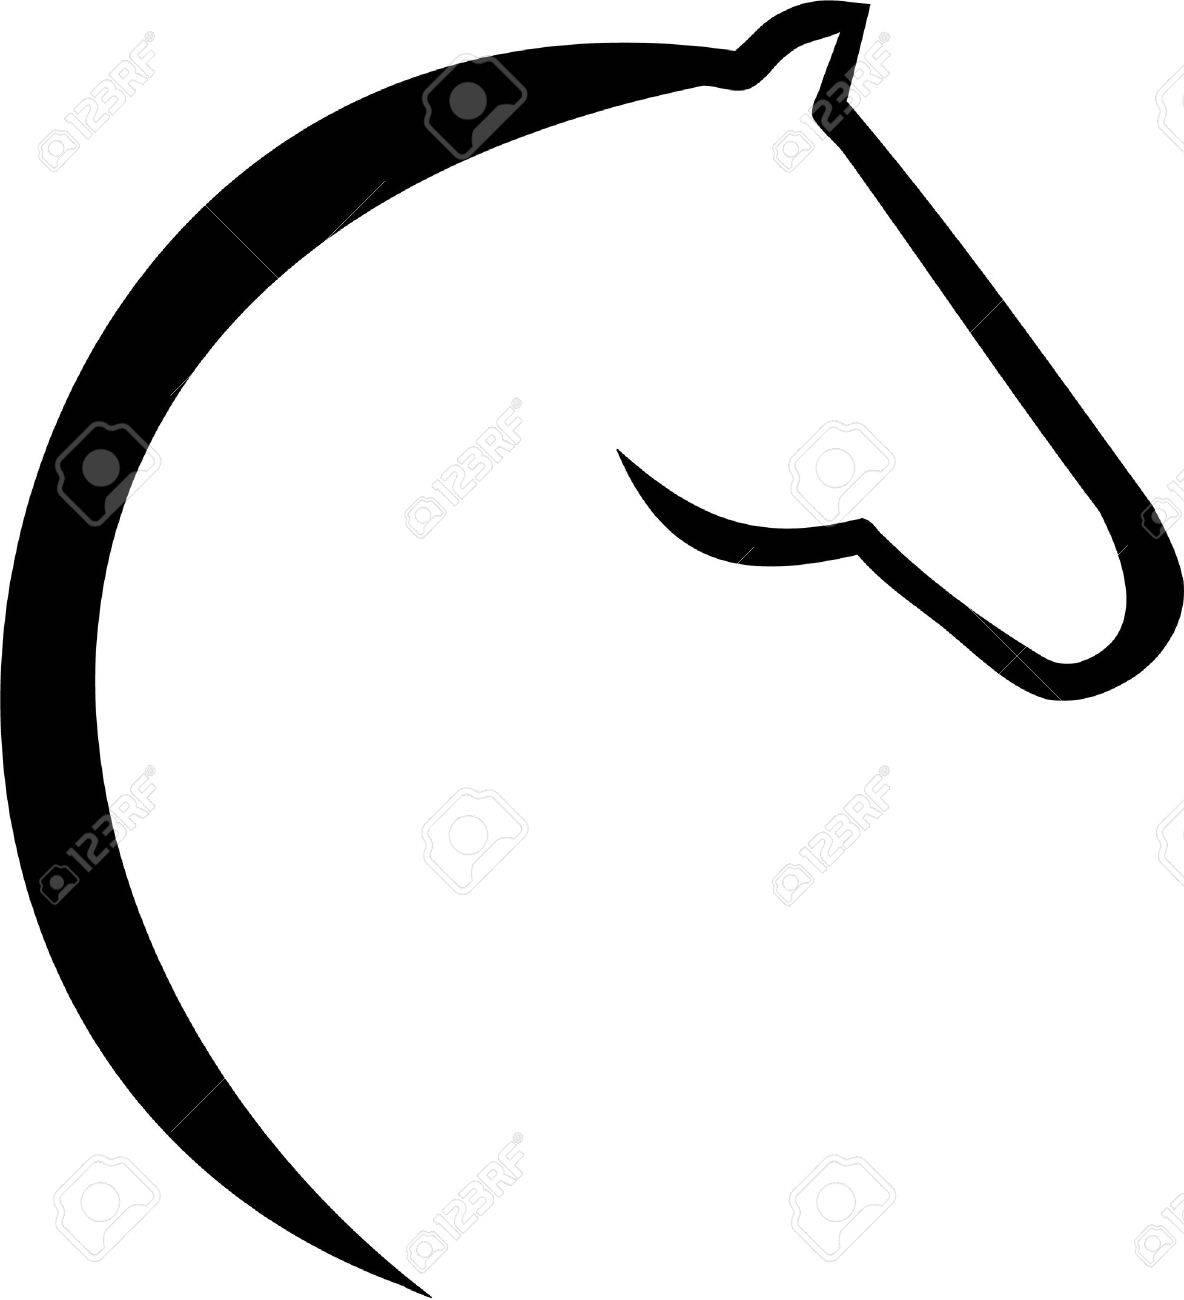 Horse head icon - 46556948